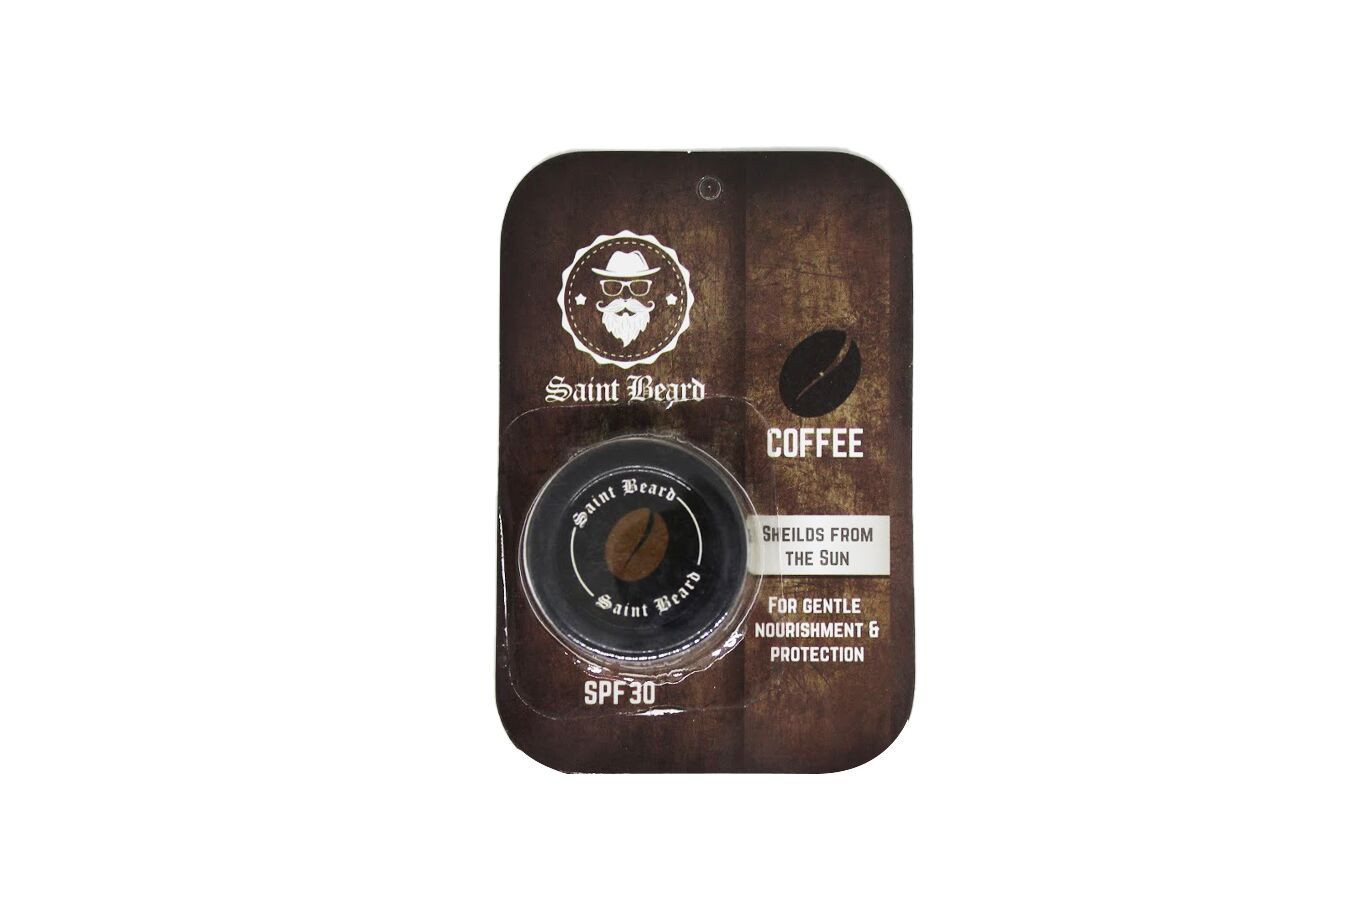 Saint Beard Lip Balm - Coffee Flavour 8 - SPF30 -For Added Sun Protection 8gm